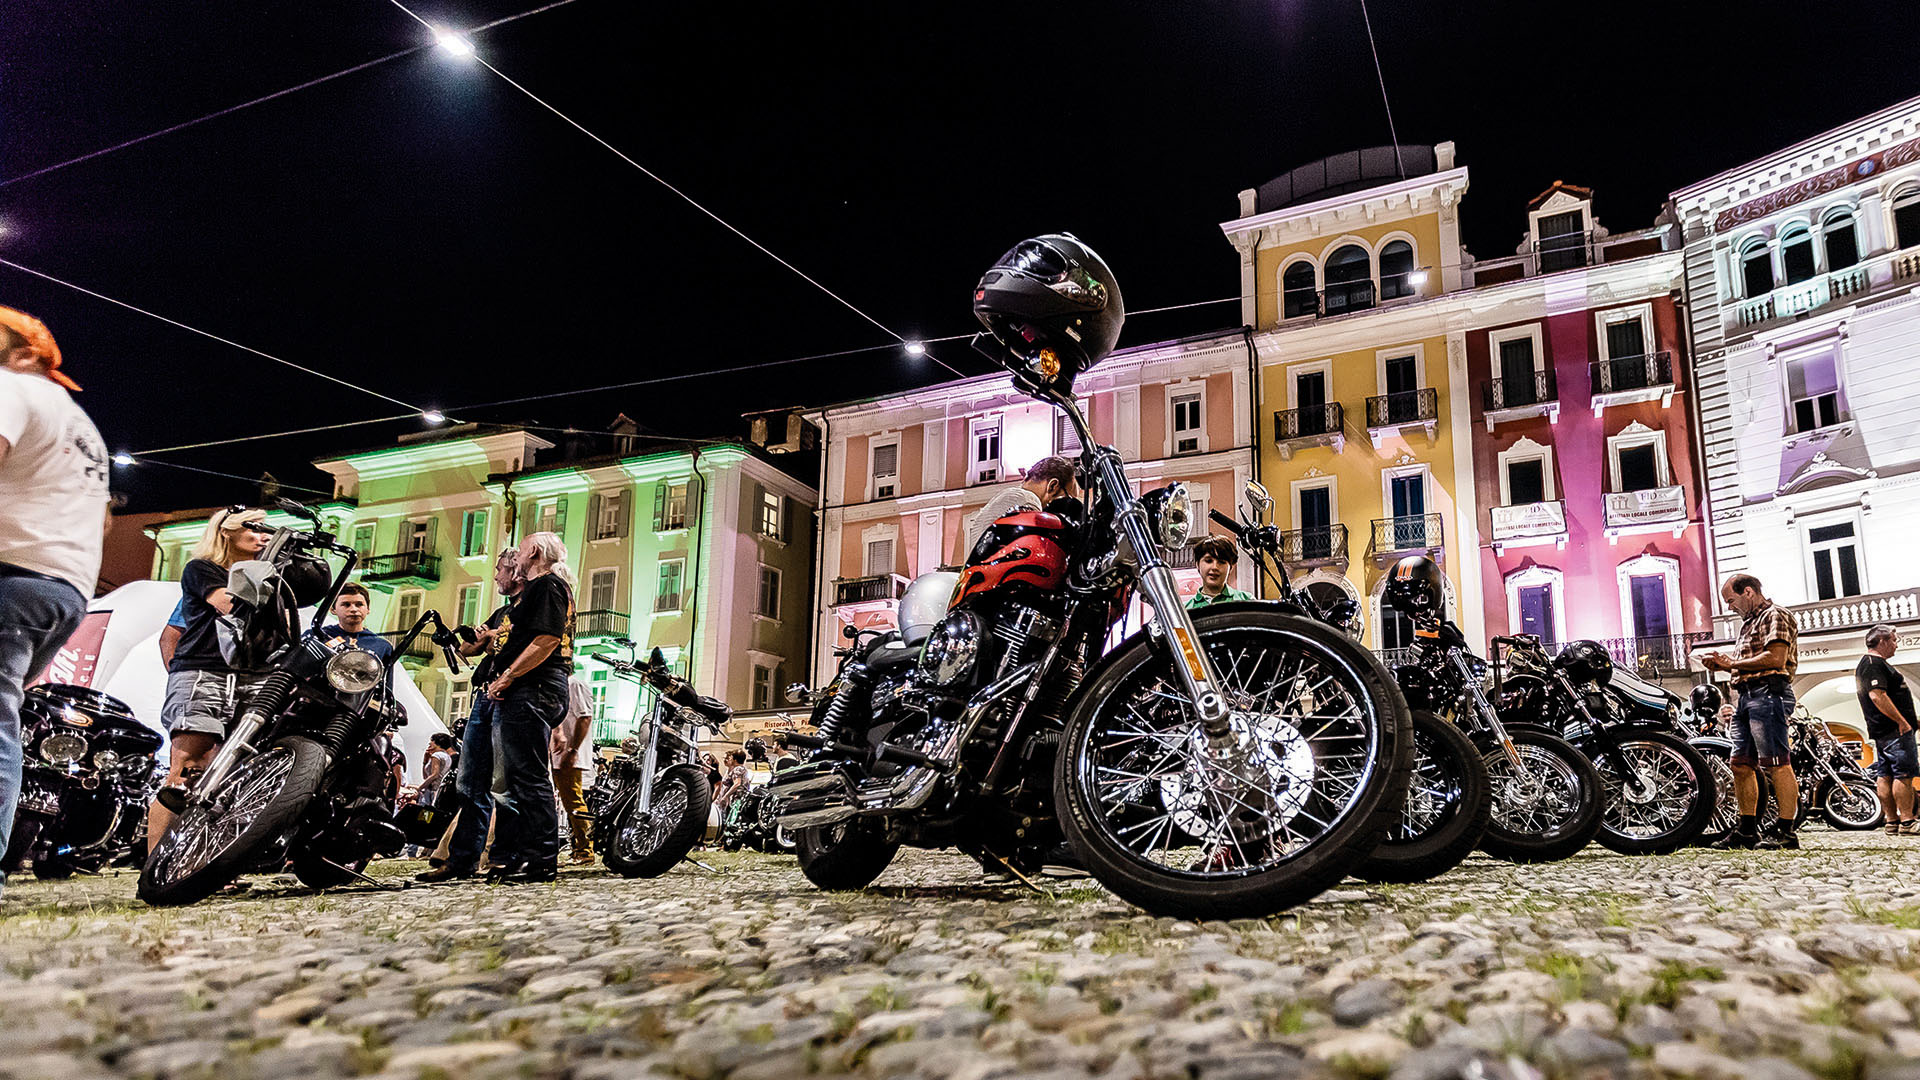 Tour 2 - Vallemaggia